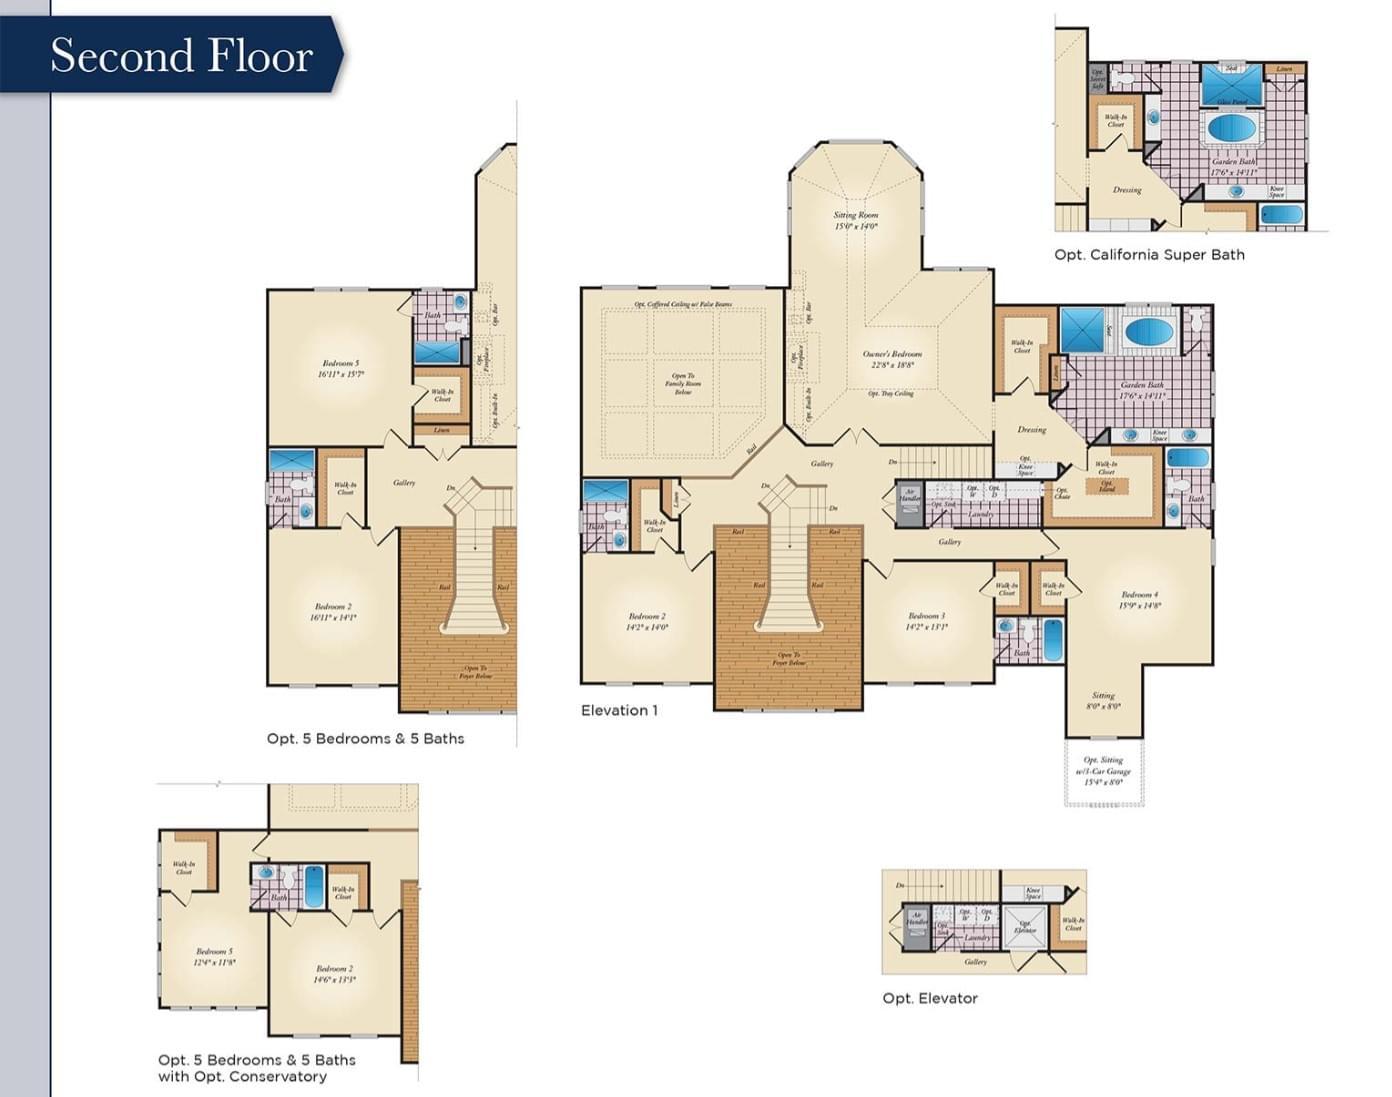 Second Floor. Monarch Home with 4 Bedrooms